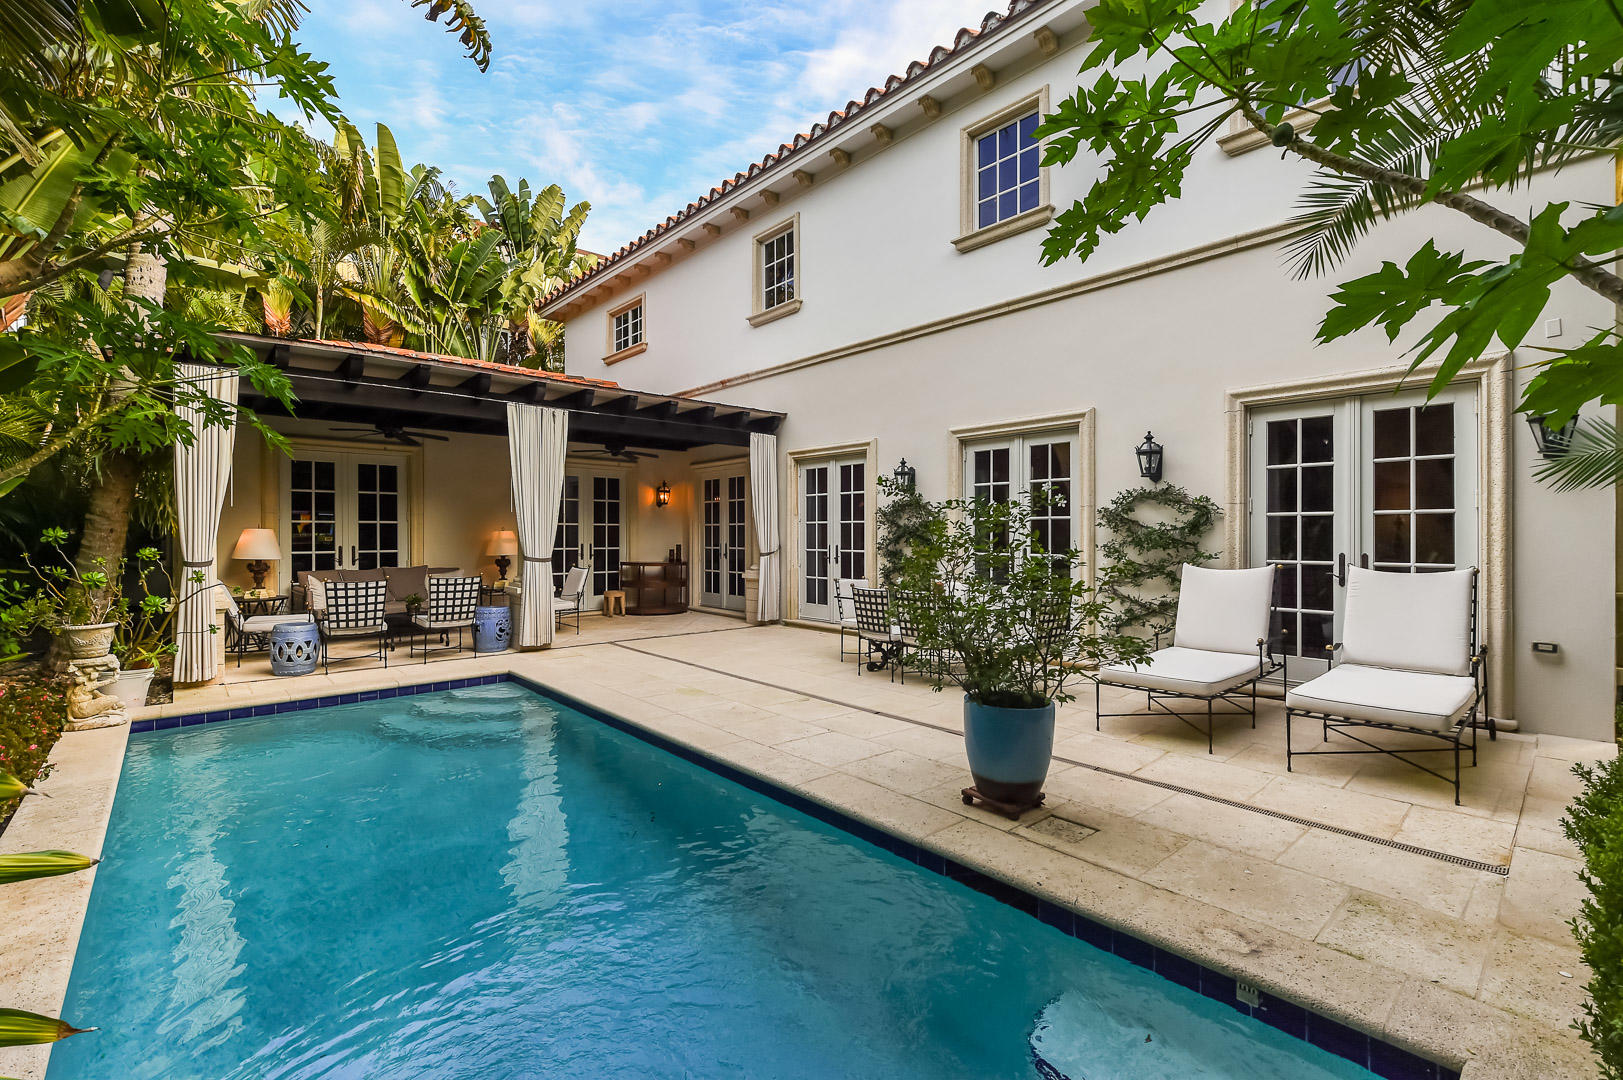 235 Atlantic Avenue, Palm Beach, Florida 33480, 4 Bedrooms Bedrooms, ,5.1 BathroomsBathrooms,Single Family,For Sale,Atlantic,RX-10496006